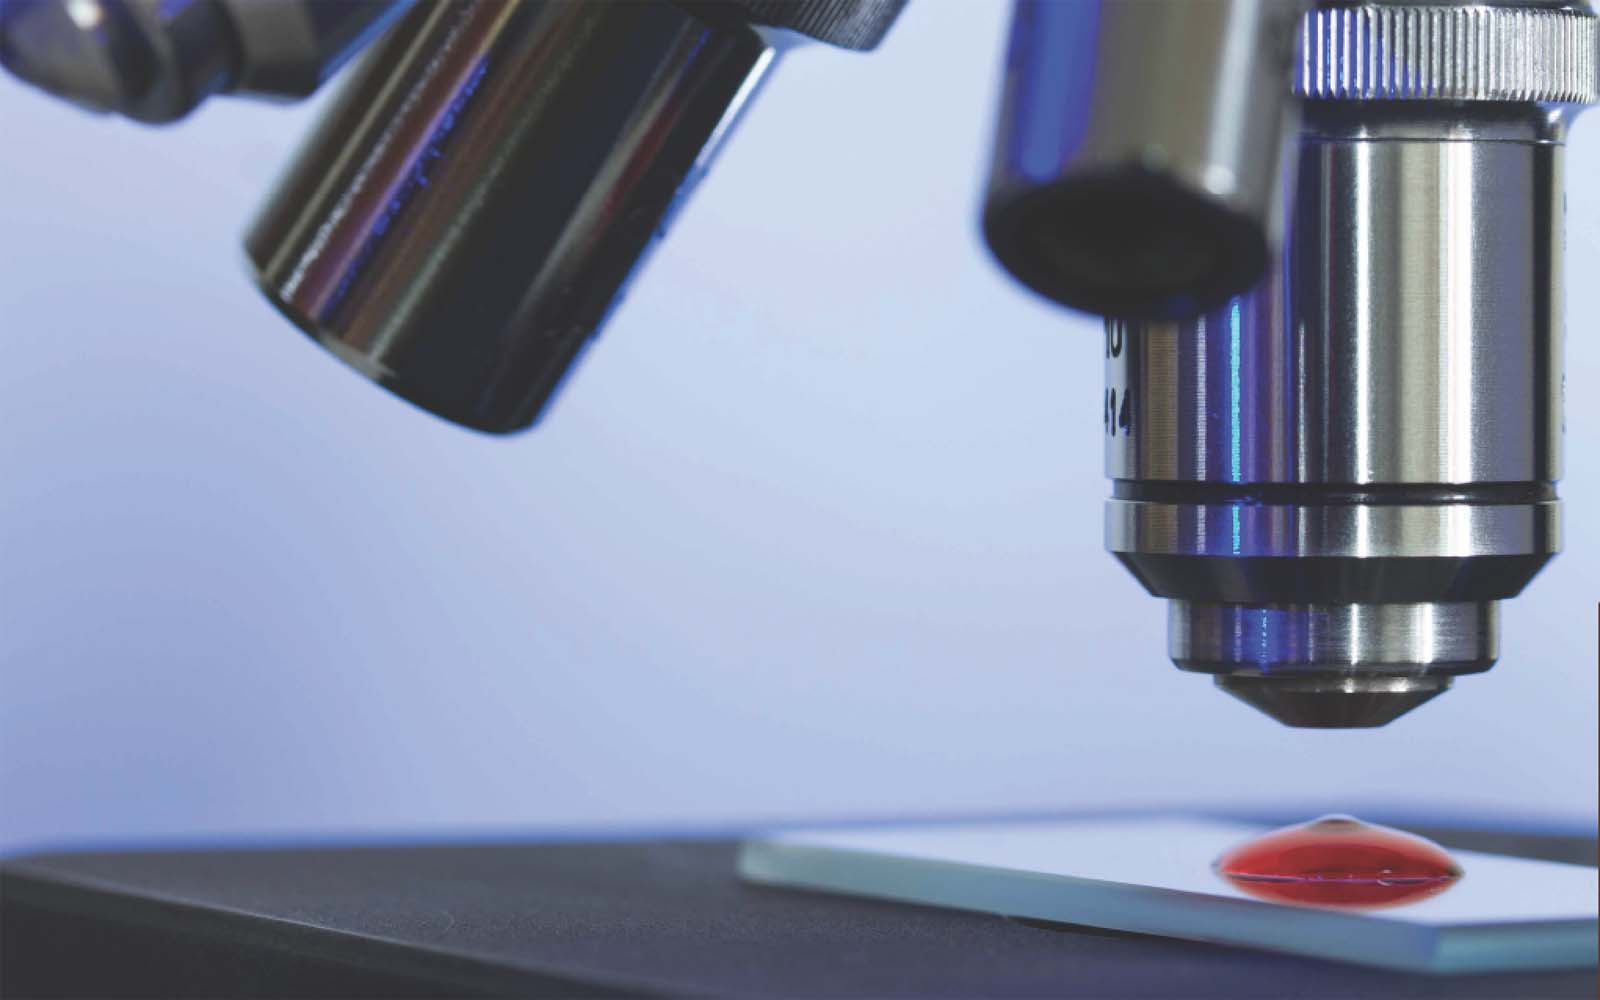 Pathology Anatomy & Cytology